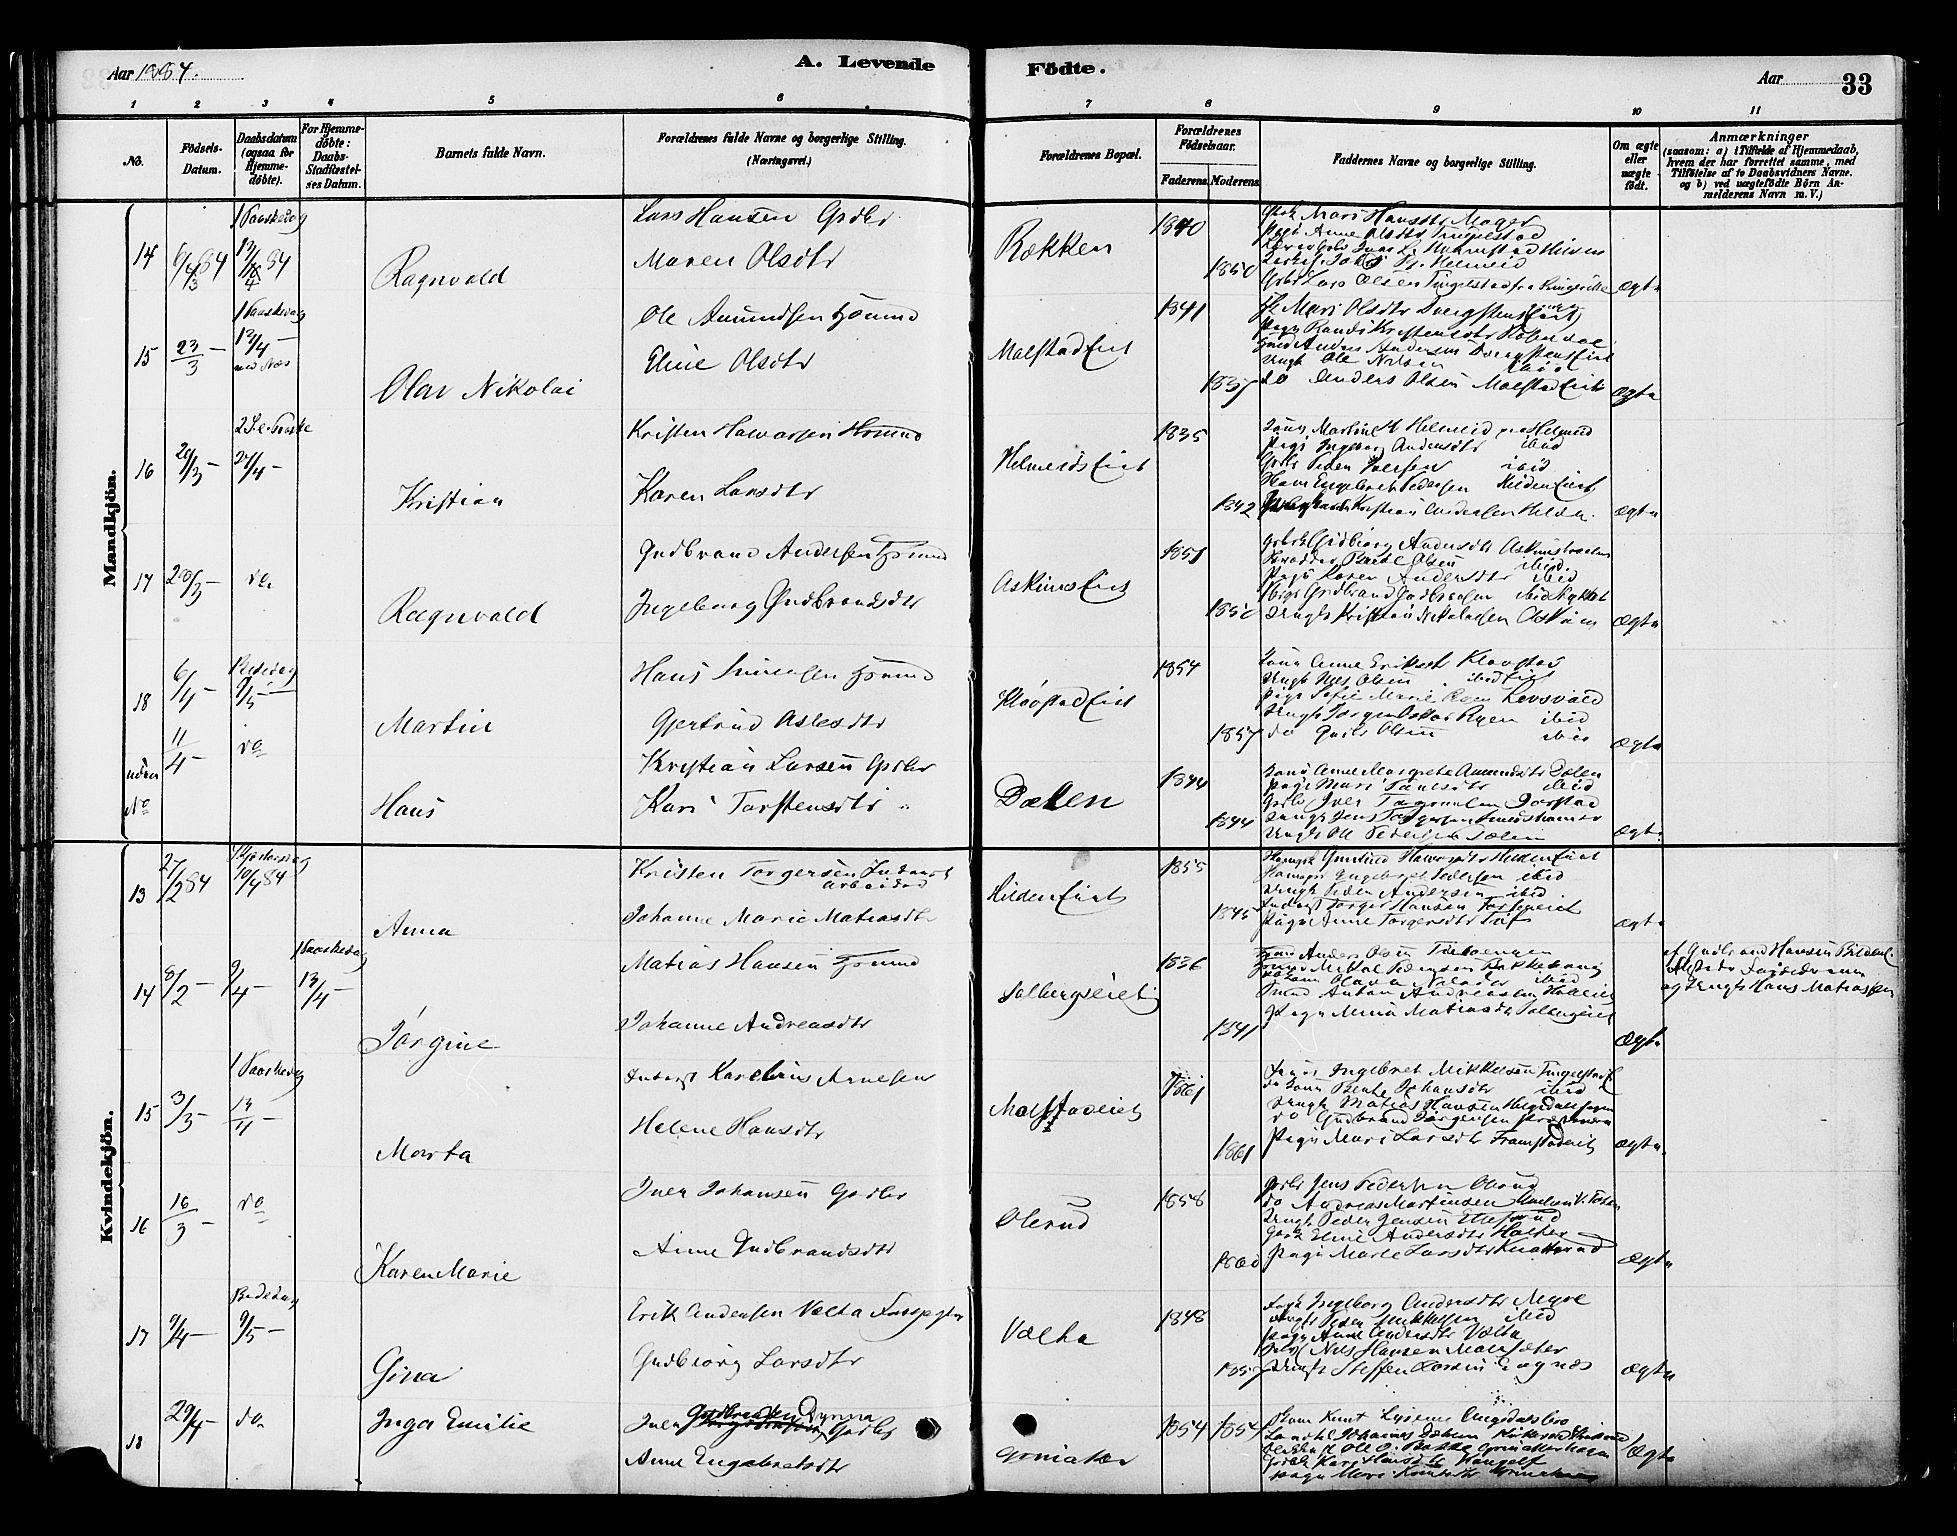 SAH, Gran prestekontor, Ministerialbok nr. 16, 1880-1888, s. 33